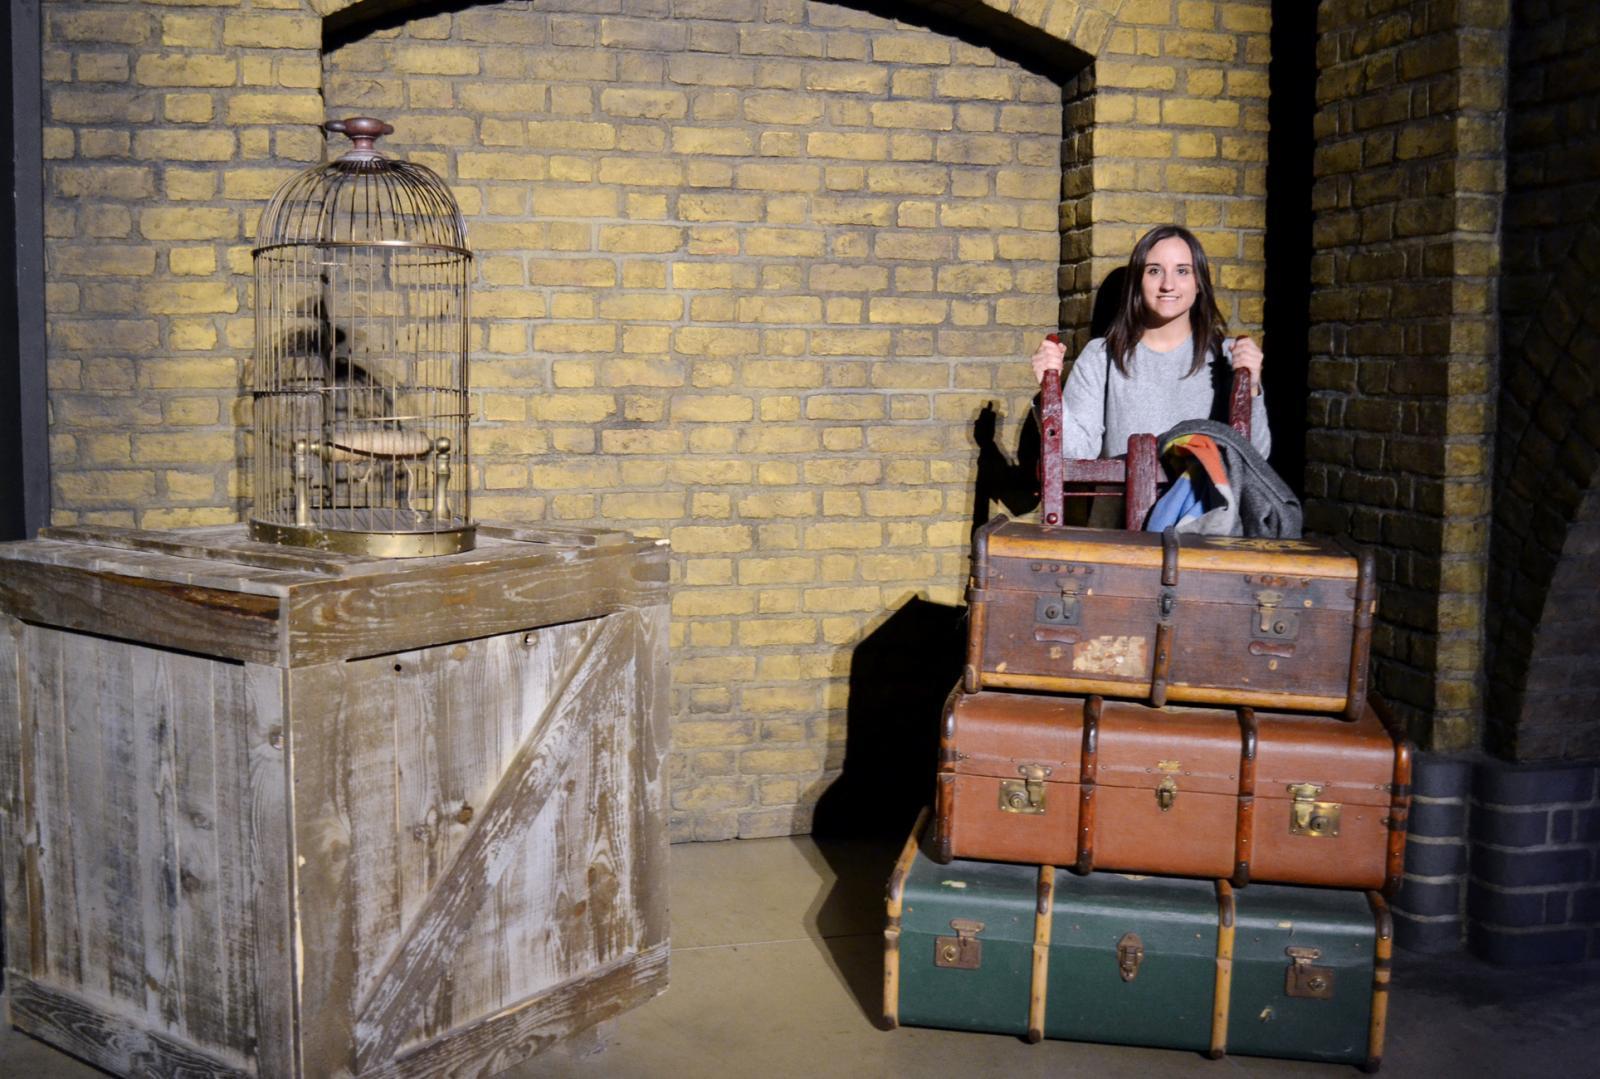 Harry-Potter-London-Hogwarts-Express